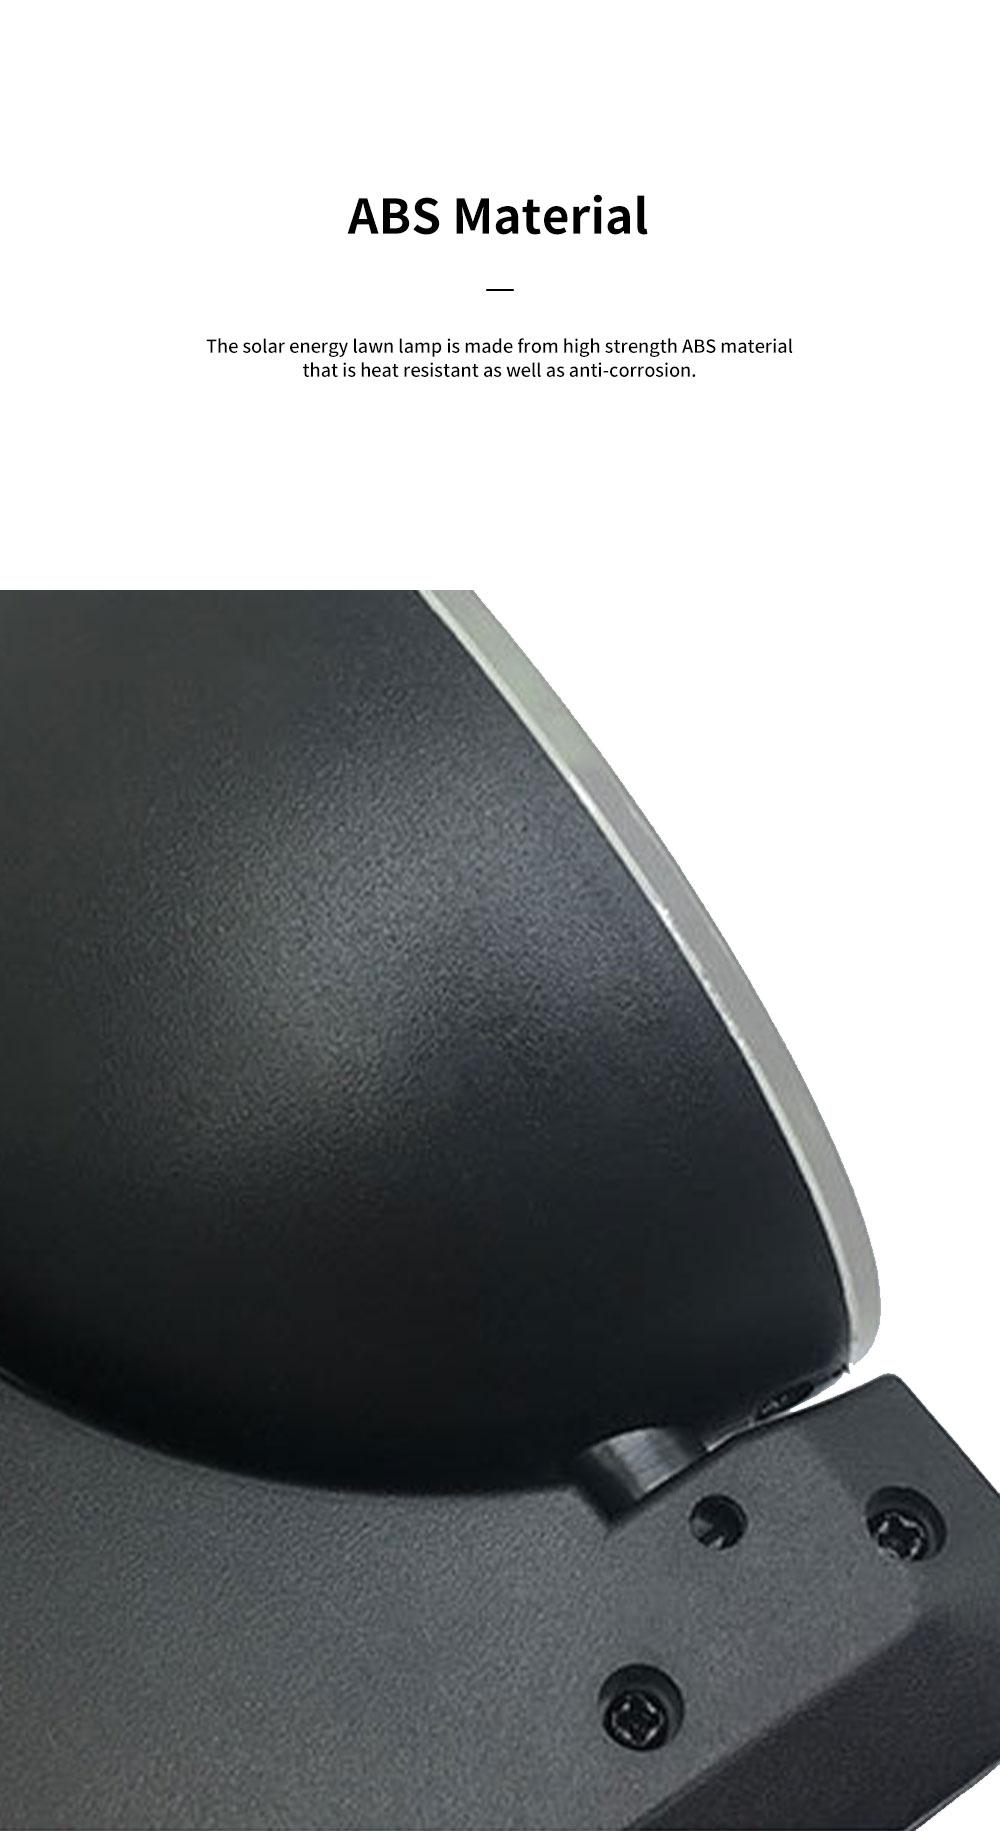 Solar Energy Ultra Thin Wall Lamp for Lawn Lighting Decoration Body Sensing Flat Panel Lawn Light Ultrathin Waterproof Lawn Lamp 3